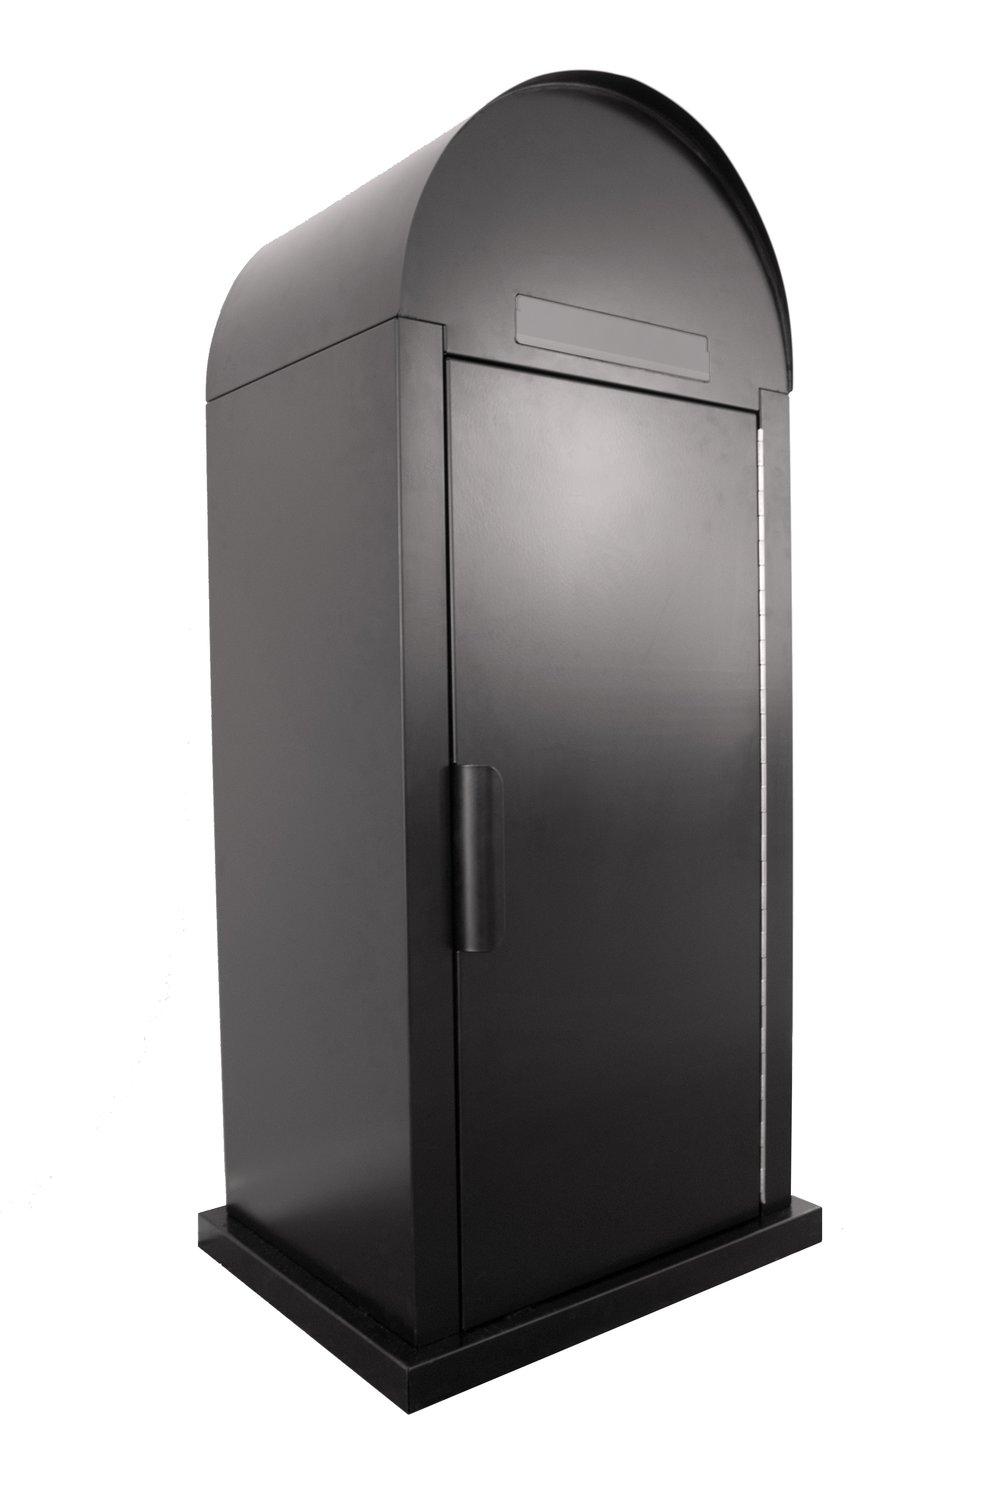 Qlocx servicebox.jpg